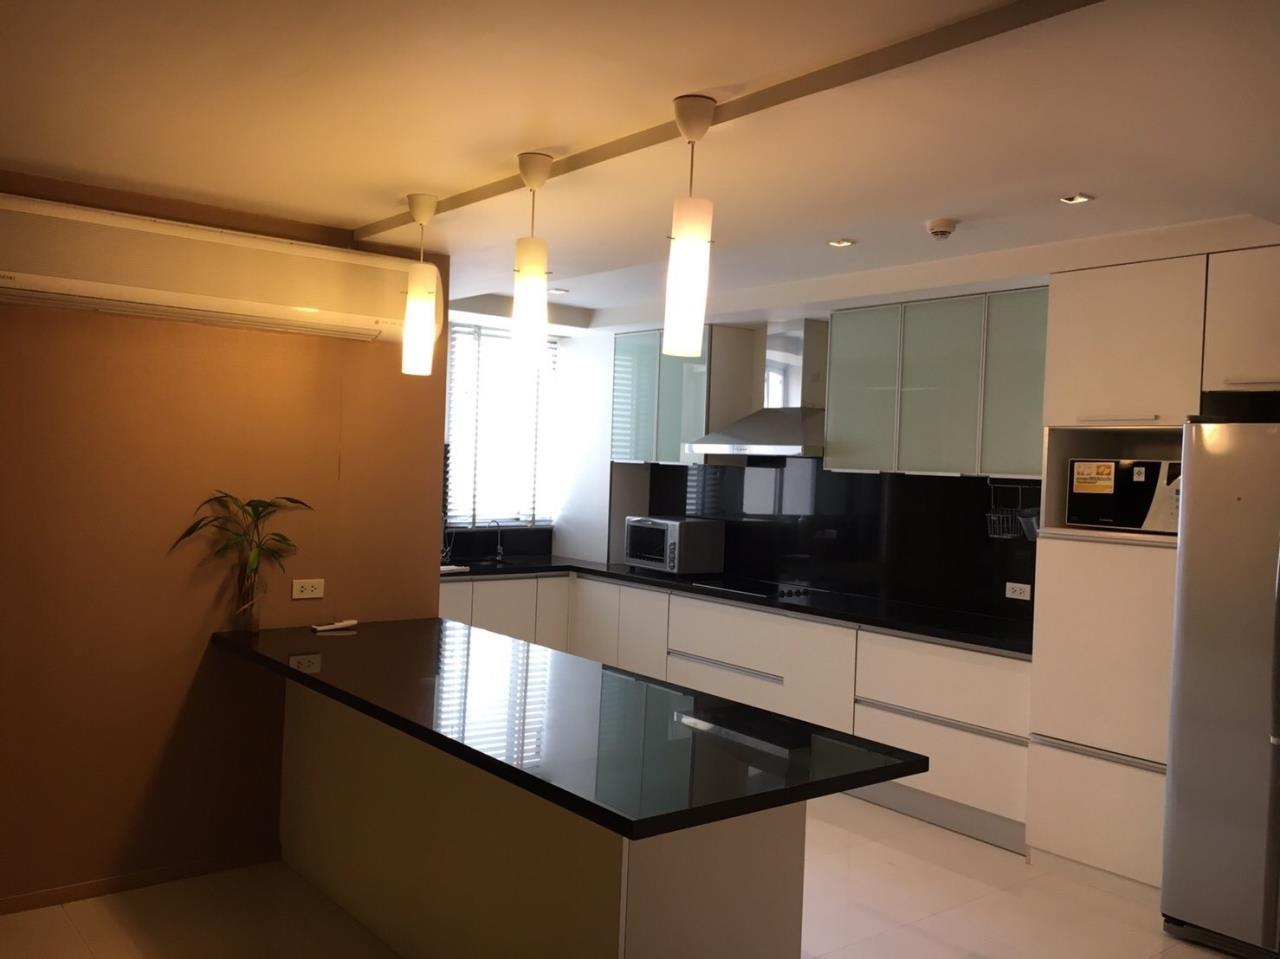 Piri Property Agency's Duplex Penthouse with 4 Bedrooms in Ekkamai - 27th Floor 6